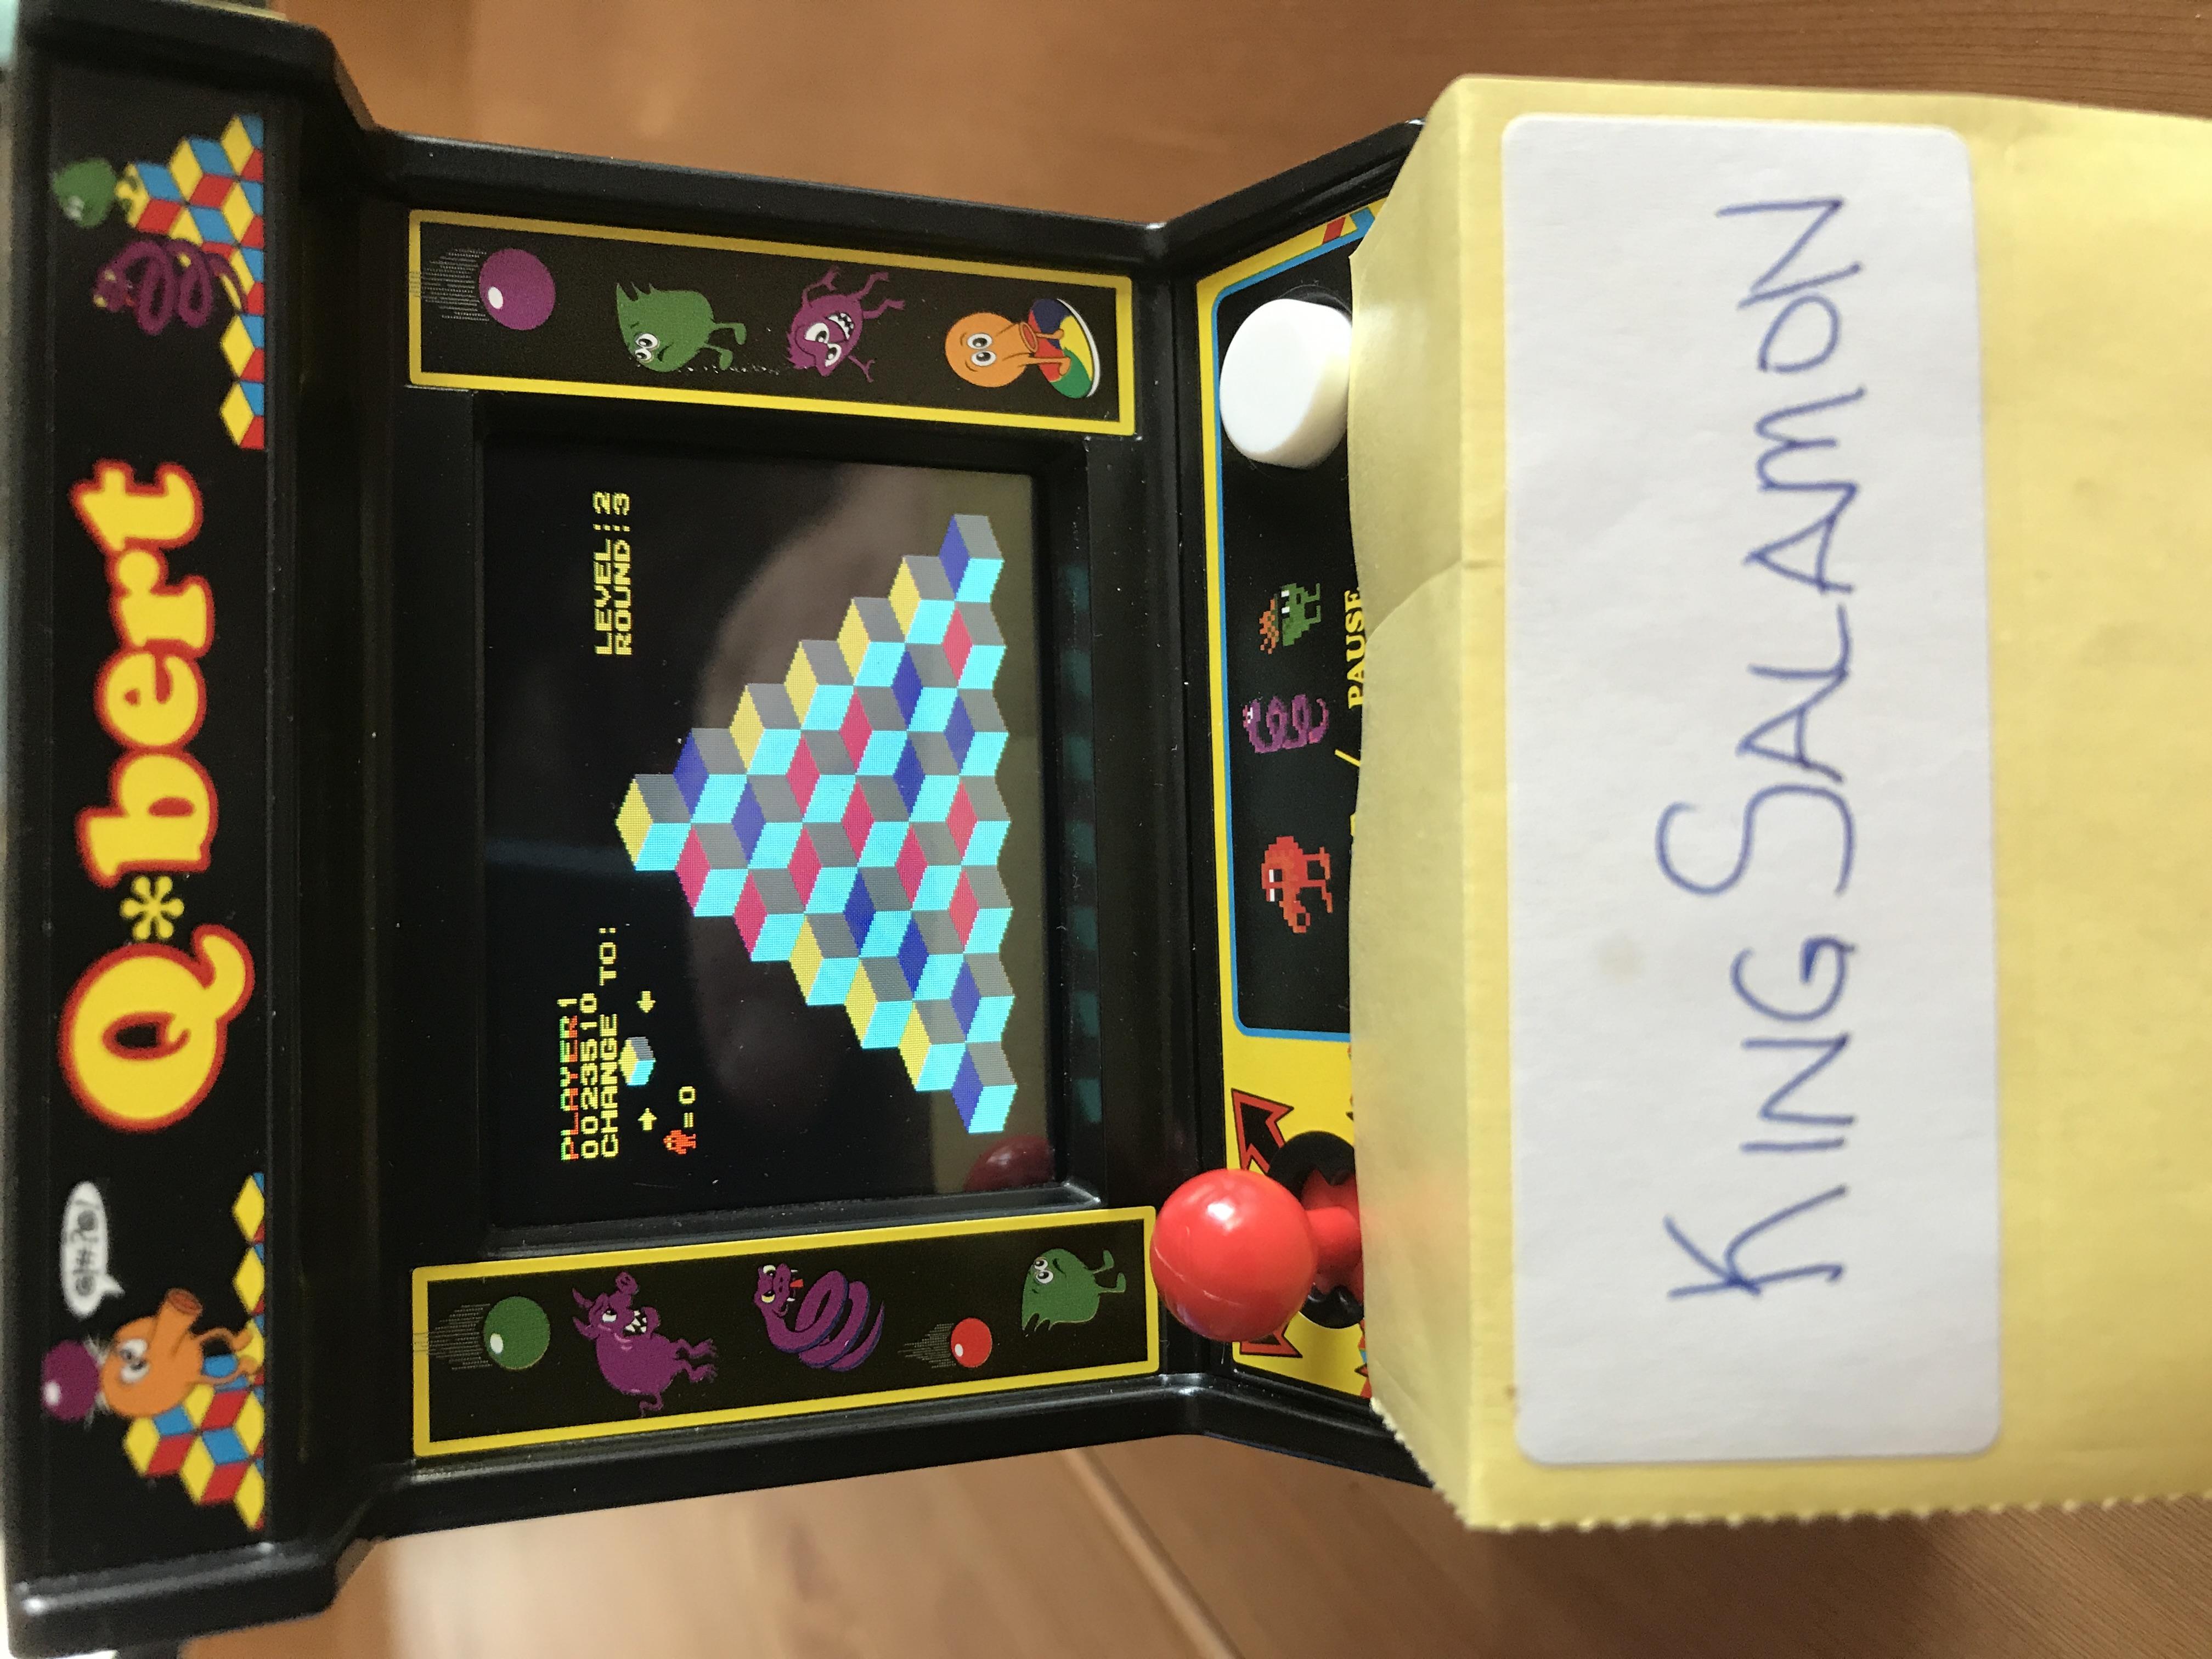 KingSalamon: Arcade Classics 04: Q*bert (Dedicated Handheld) 23,510 points on 2018-05-13 19:20:57